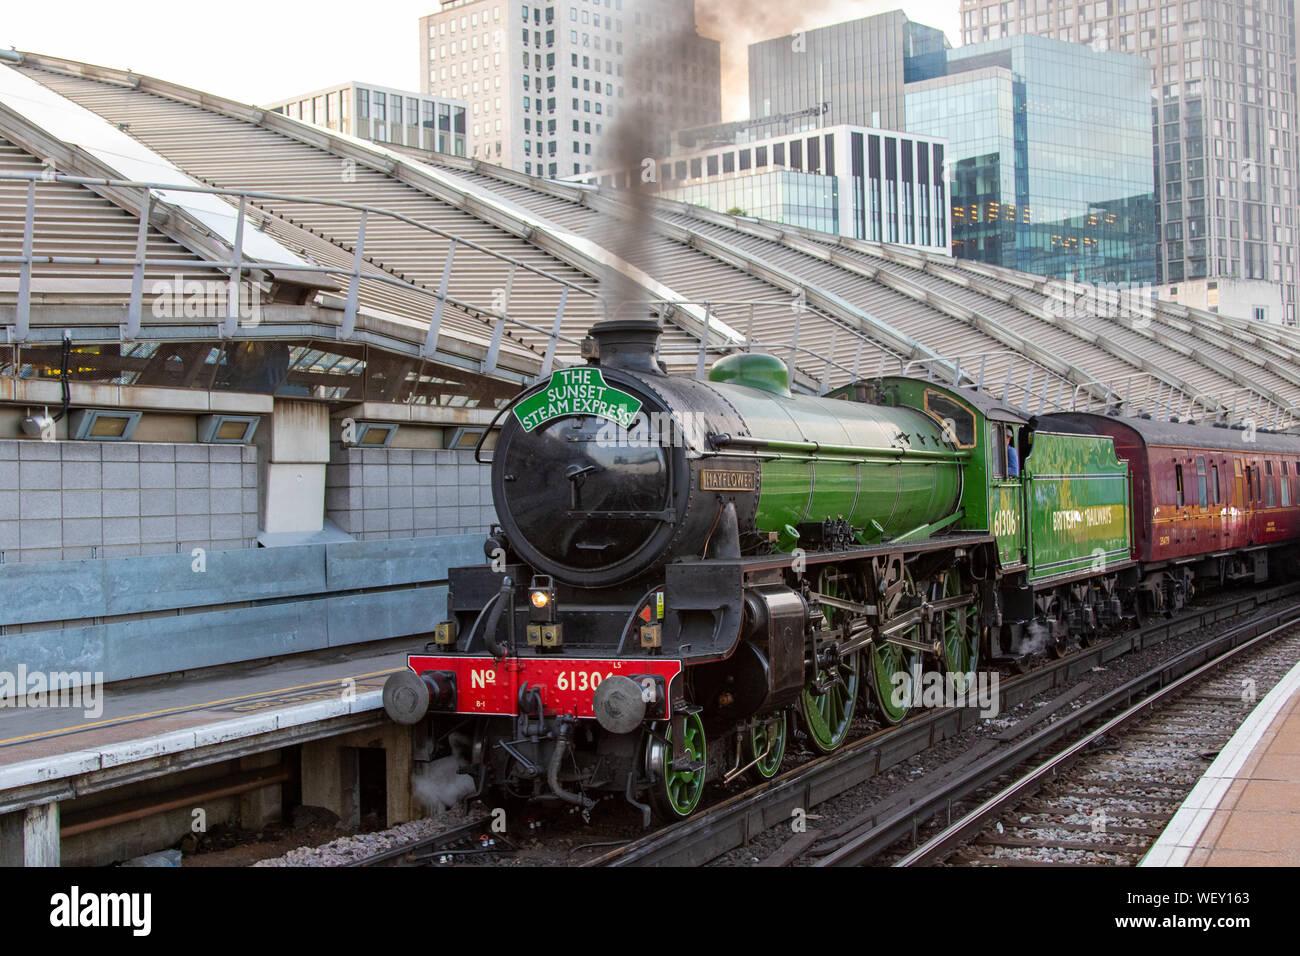 LNER Class B1, 61306 Mayflower, at Waterloo Station Stock Photo